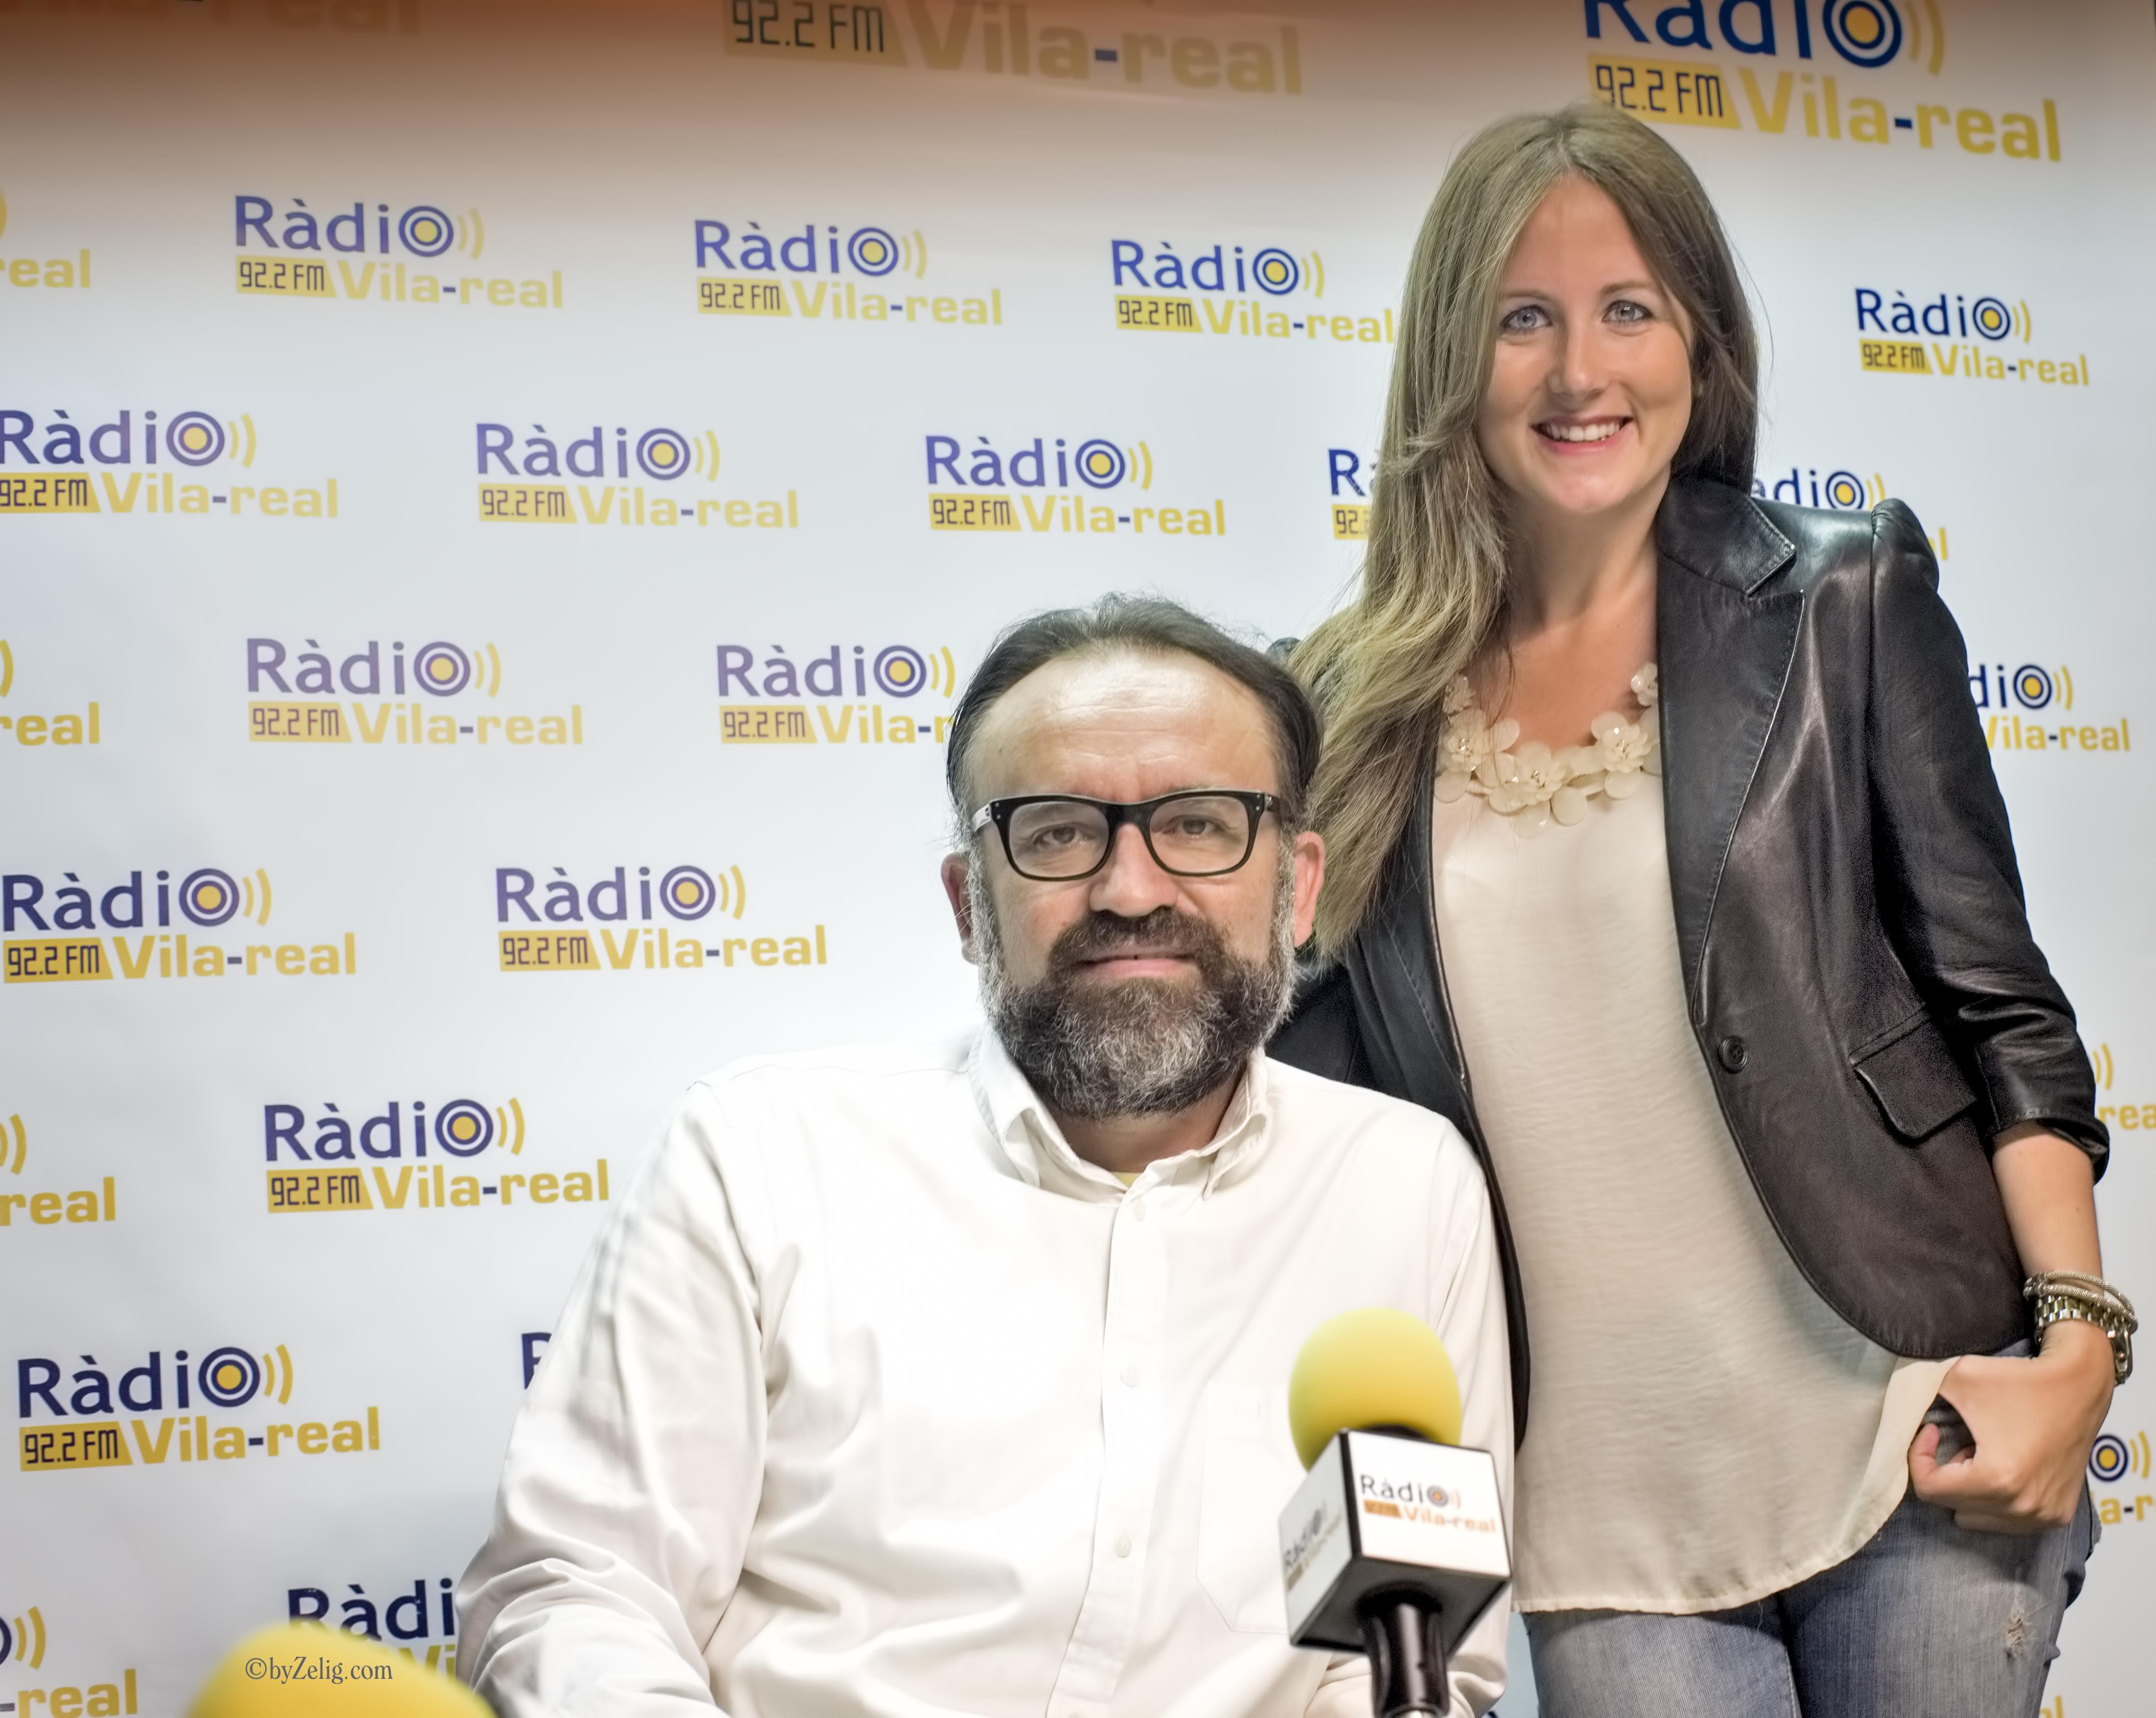 Esports Radio Vila-real. Programa del 26 de octubre 2017